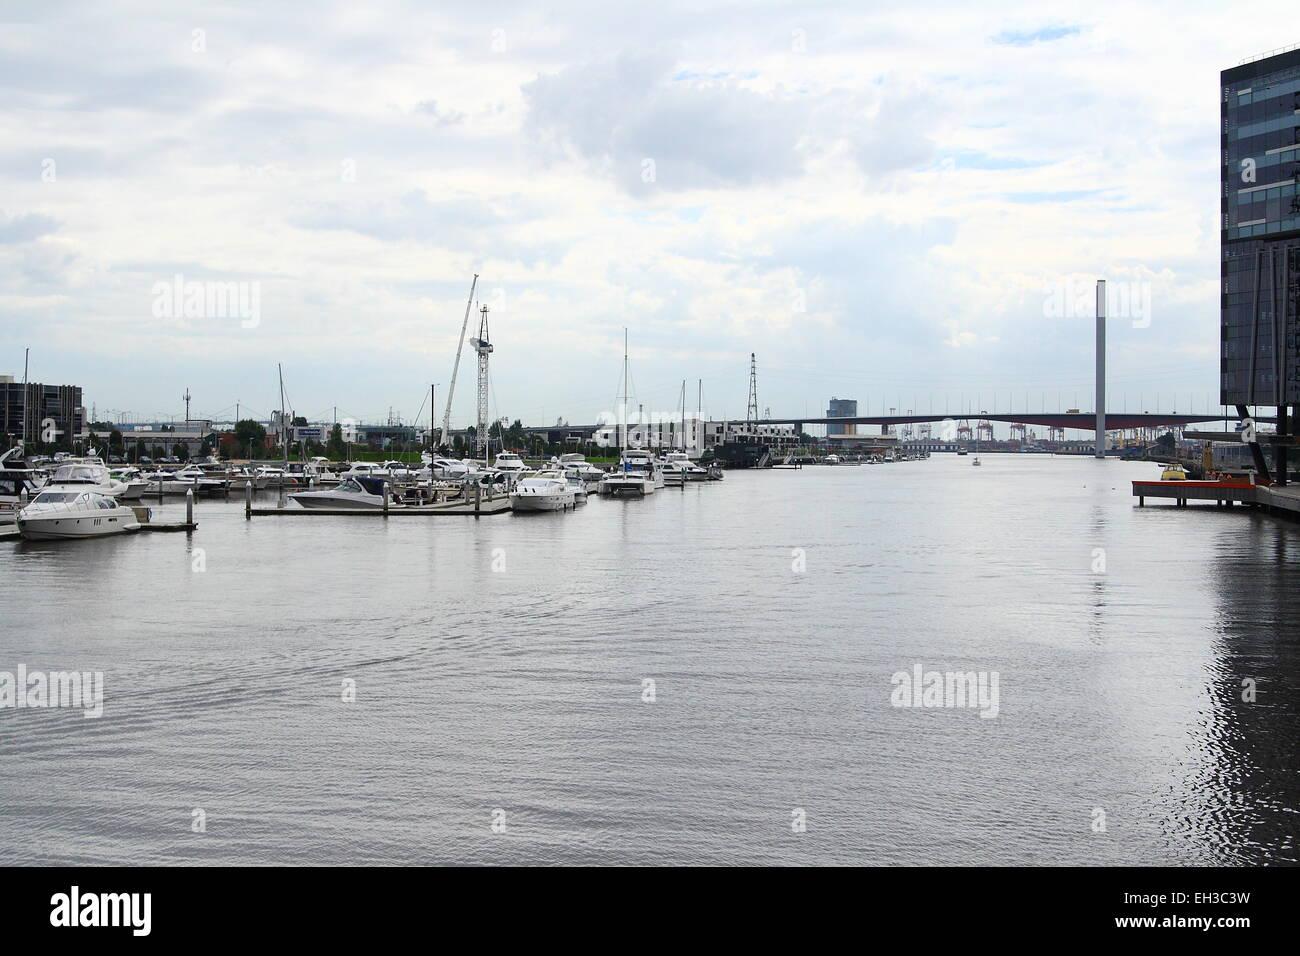 Docklands Melbourne Victoria Australia - Stock Image